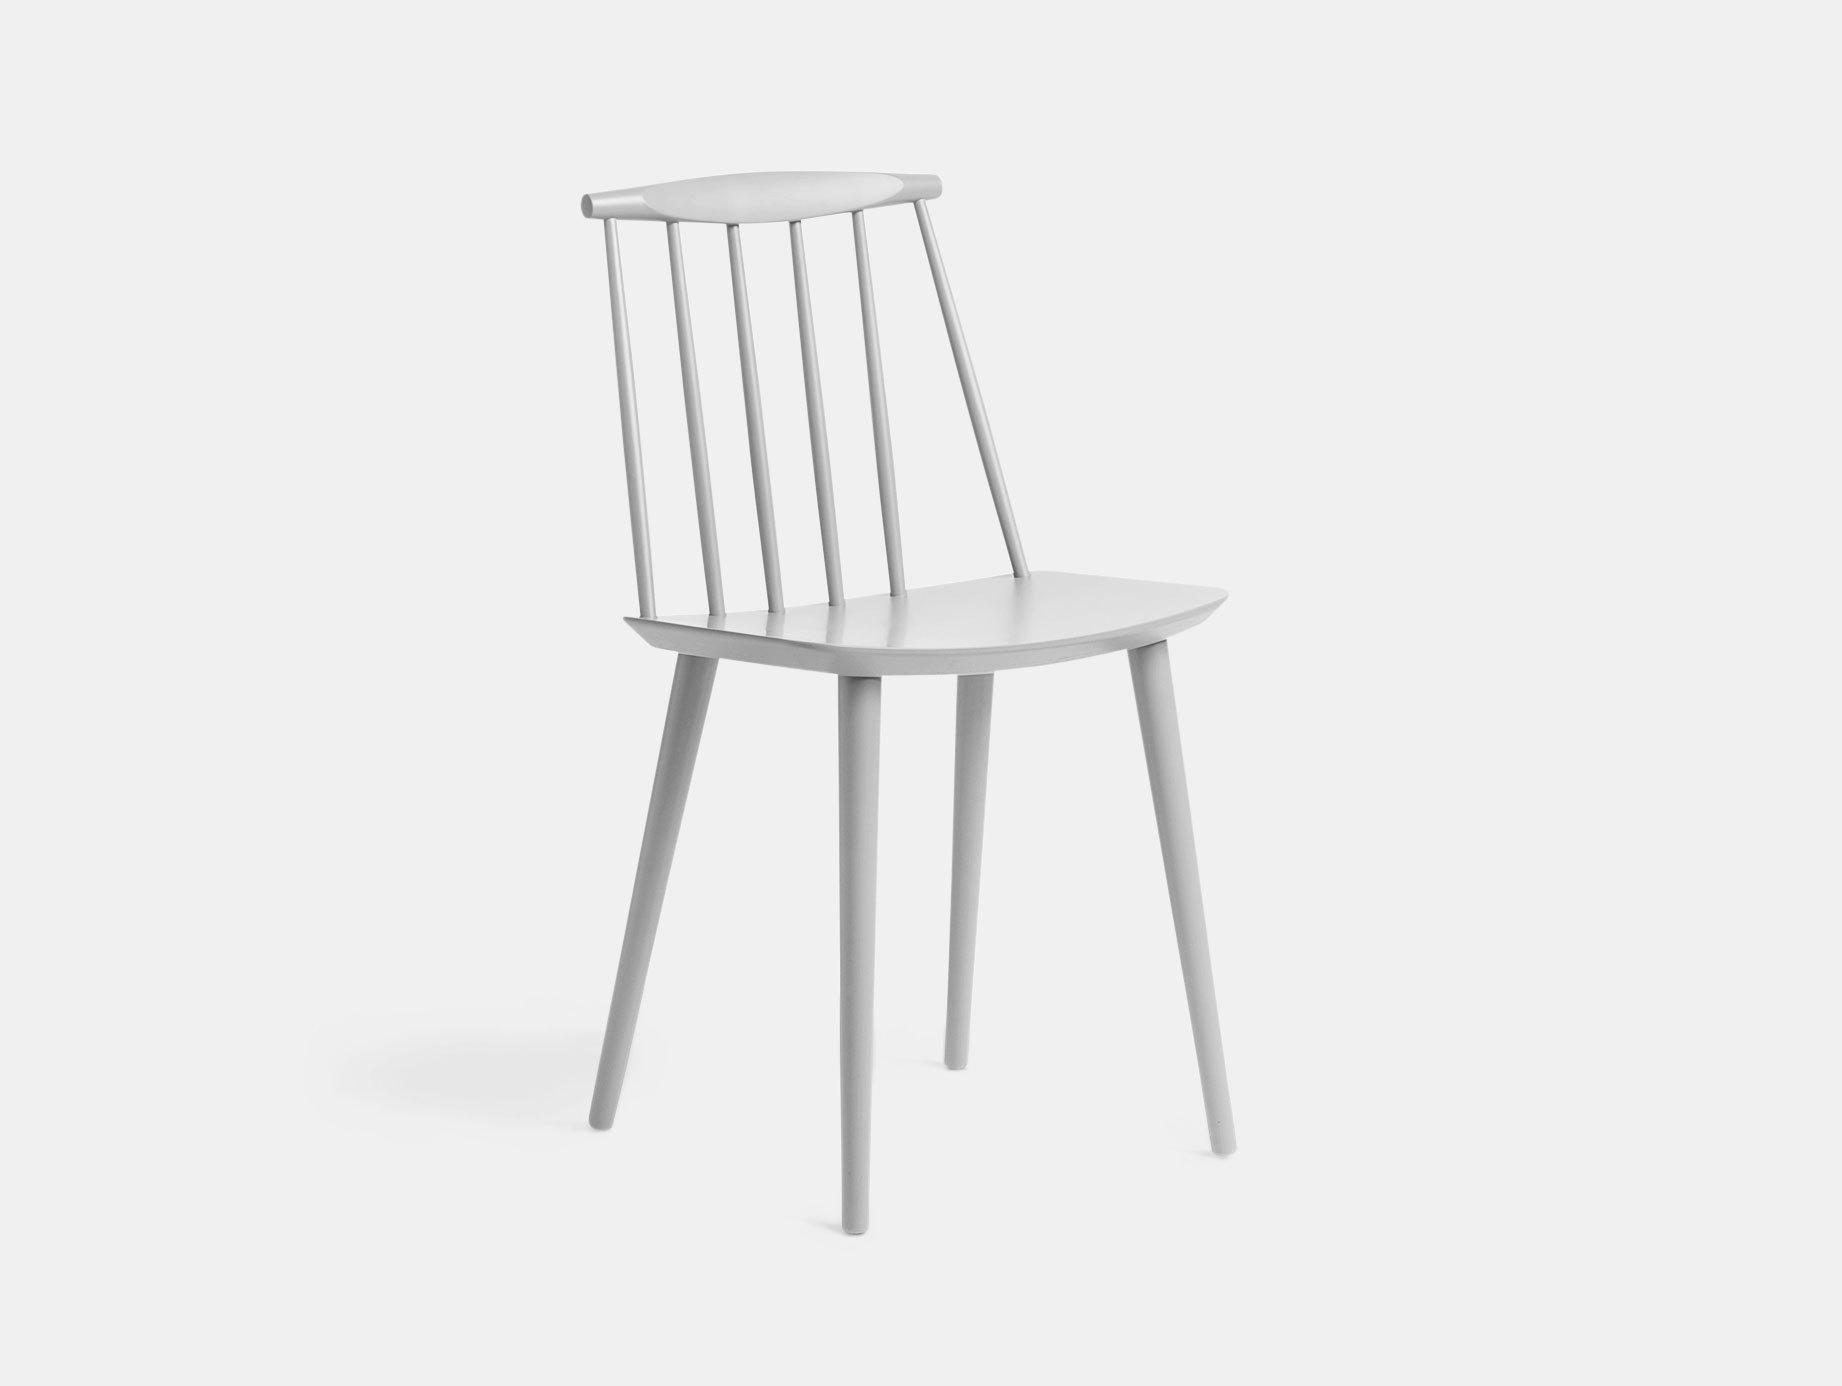 J77 Chair image 1